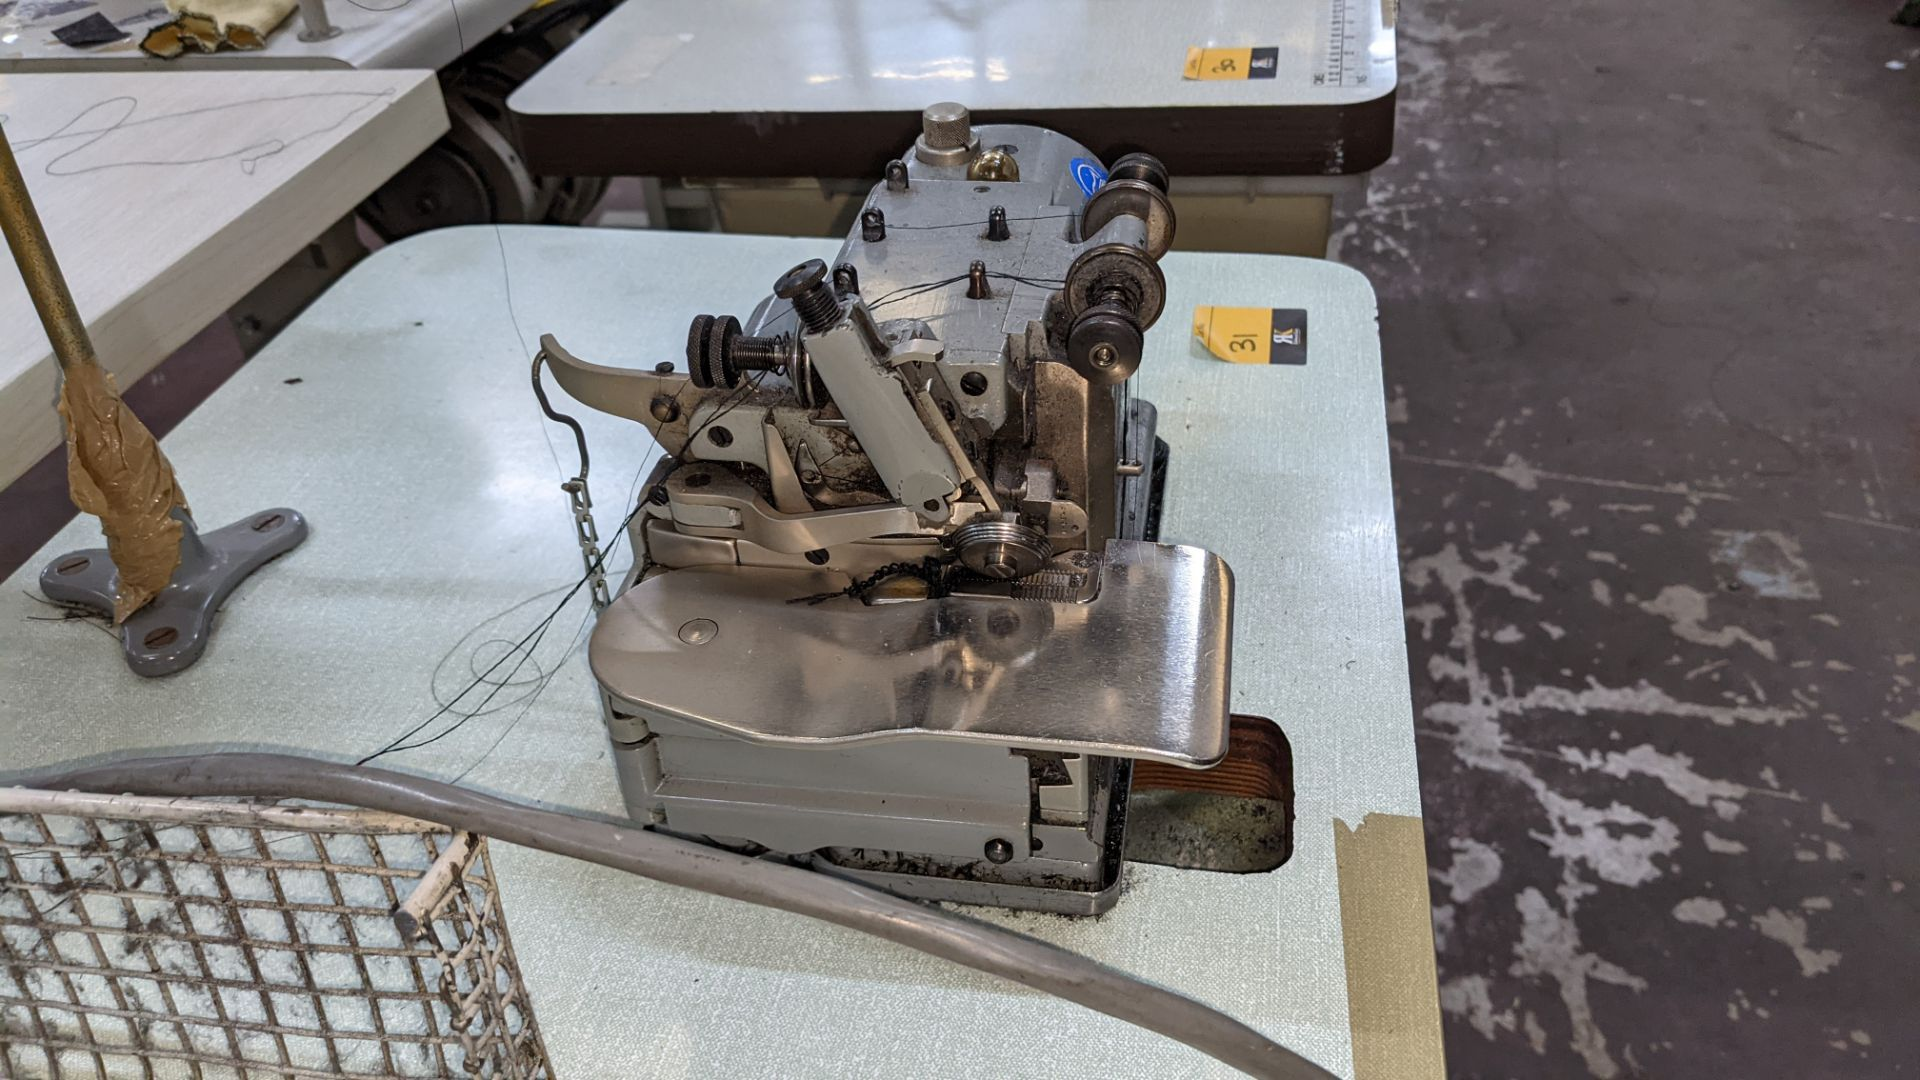 Merrow sewing machine, model M-30 - Image 8 of 14